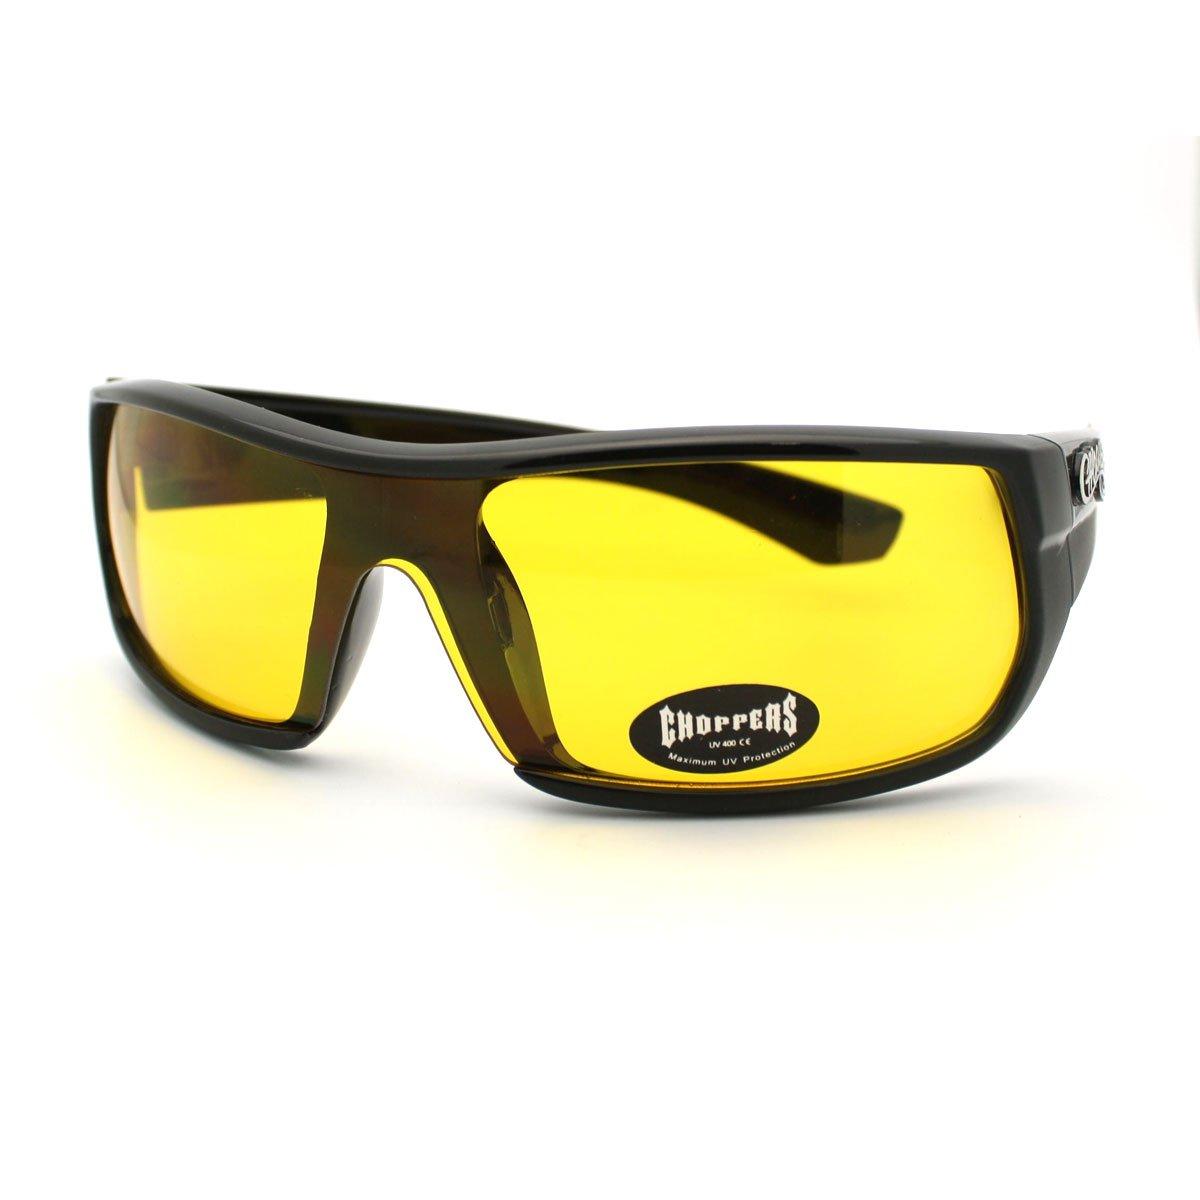 Mens Choppers Sunglasses Sporty Biker Style Rectangular Shield Wrap Frames